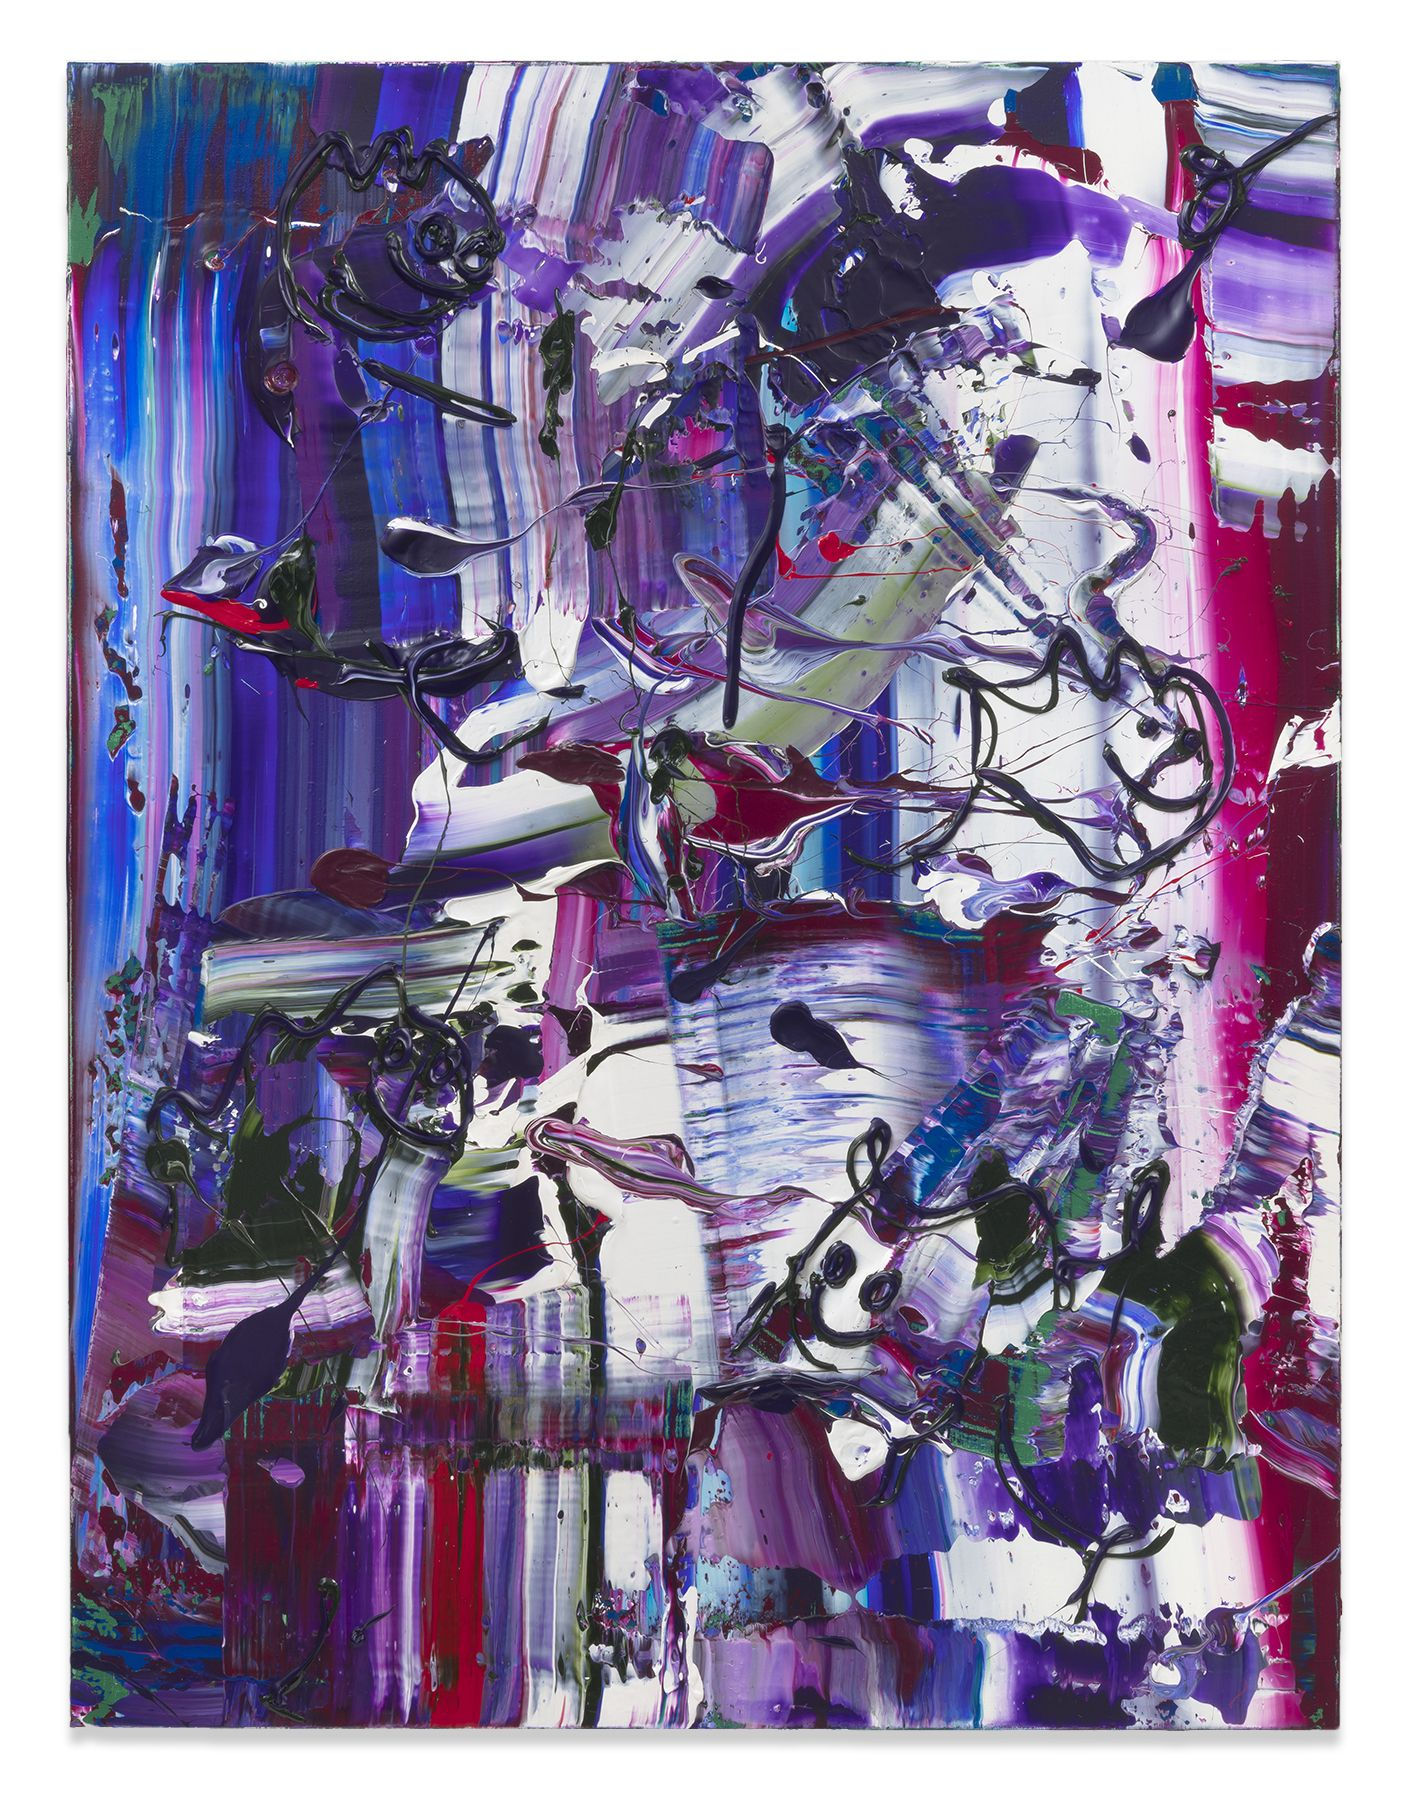 Michael Reafsnyder, Sweet Falls, 2019, Acrylic on linen